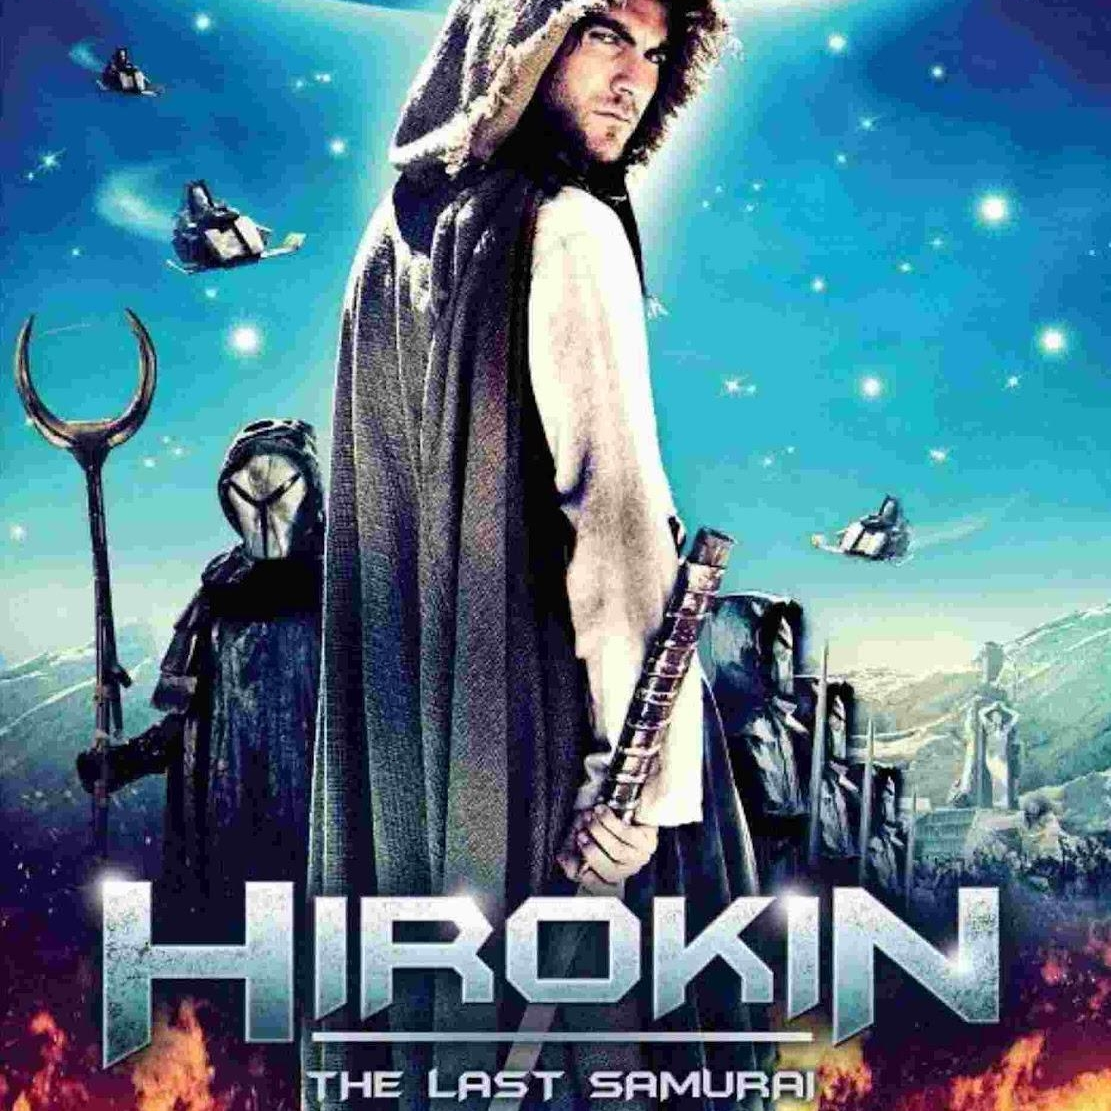 HIROKIN: THE LAST SAMURAI,  Ithaka Ent  Dir: Alejo Mo Sun  Costume Designer: Jessica Wenger